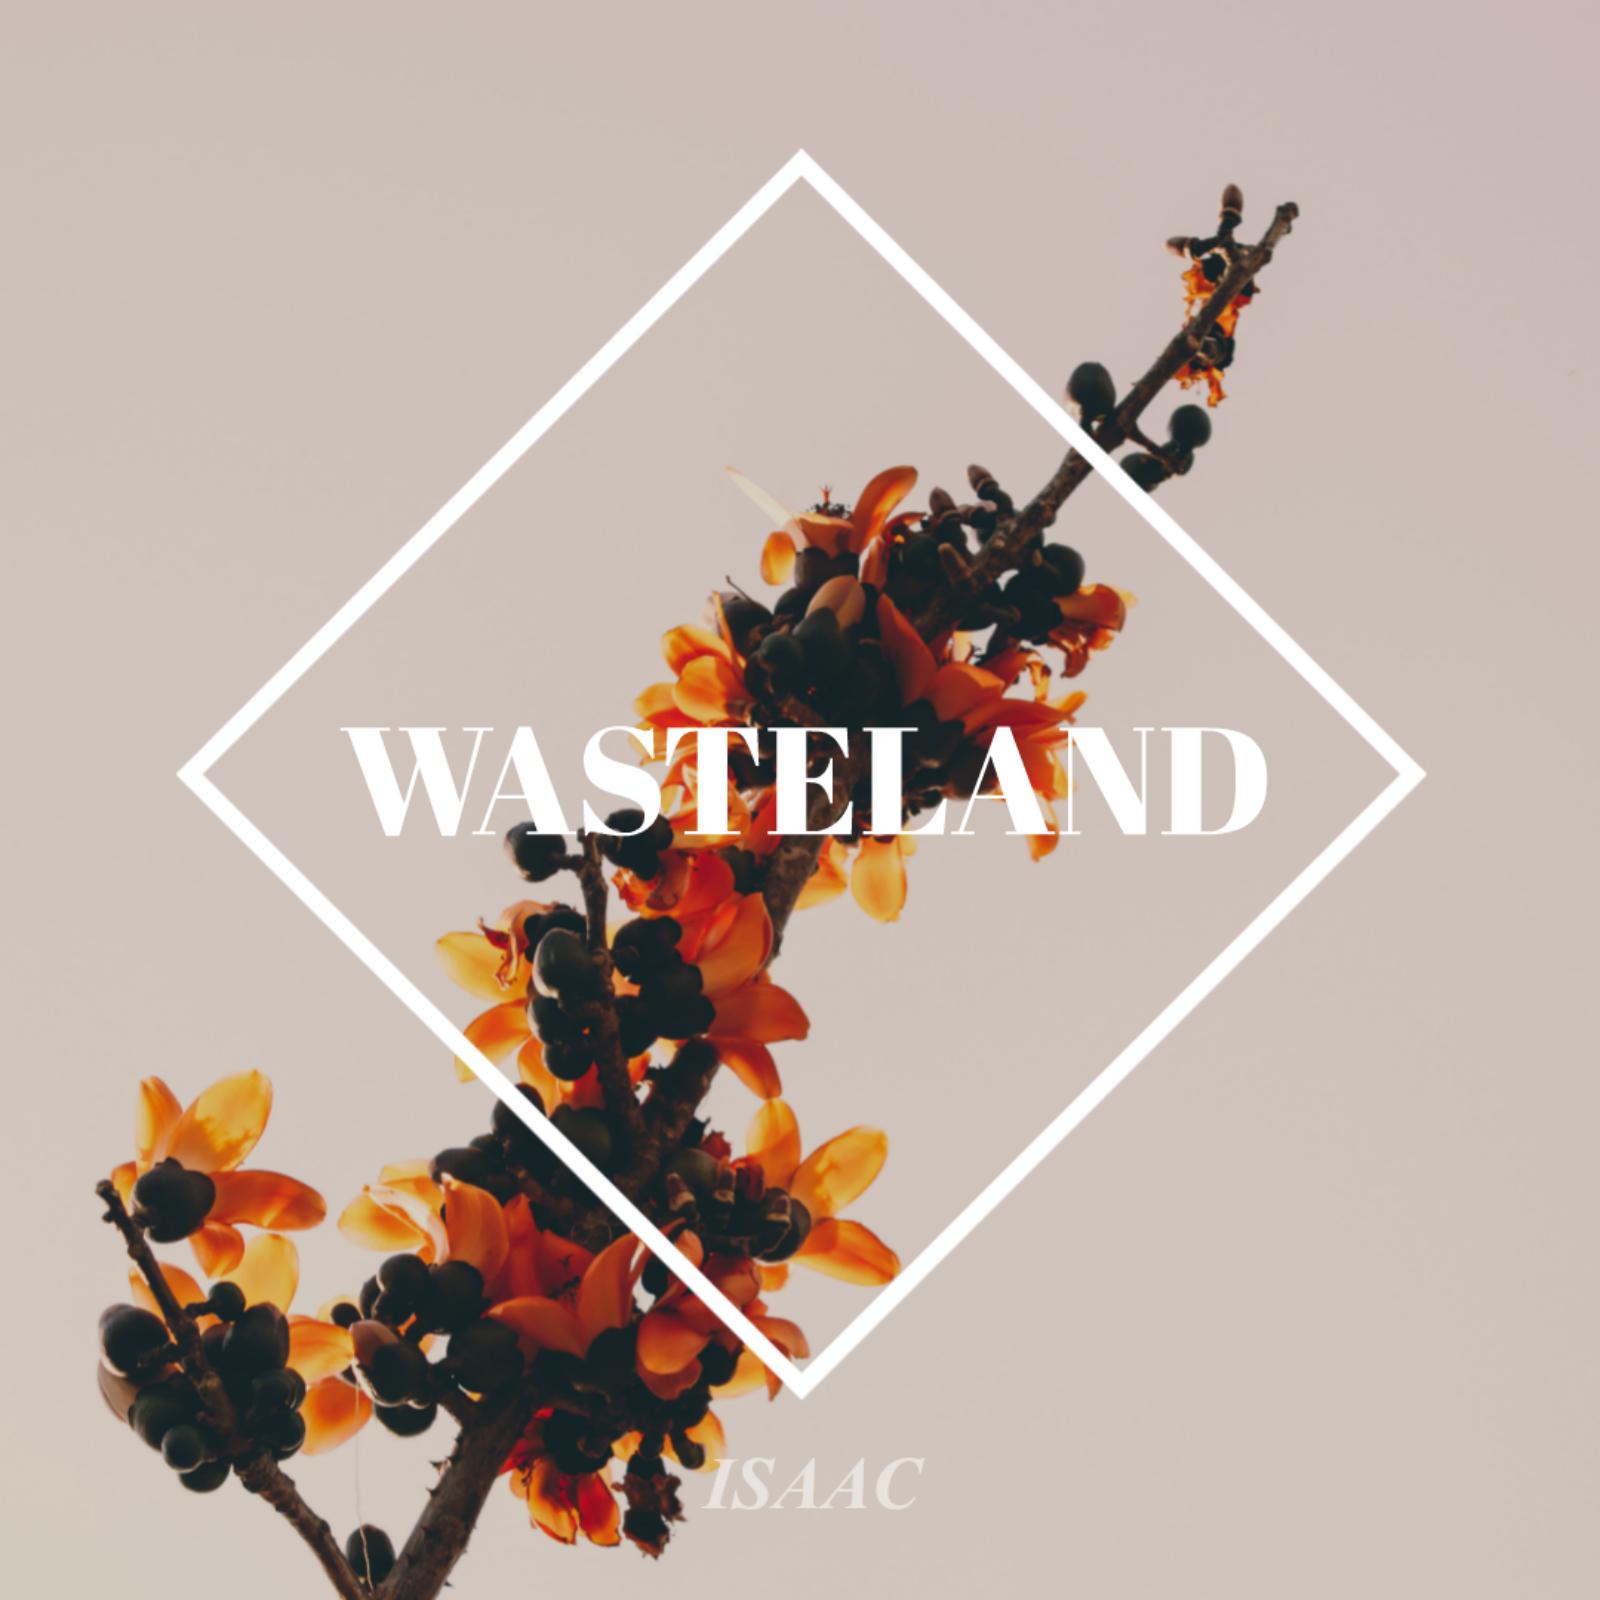 Isaac - Wasteland   Daniel Bacigalupi   Soulstride Records